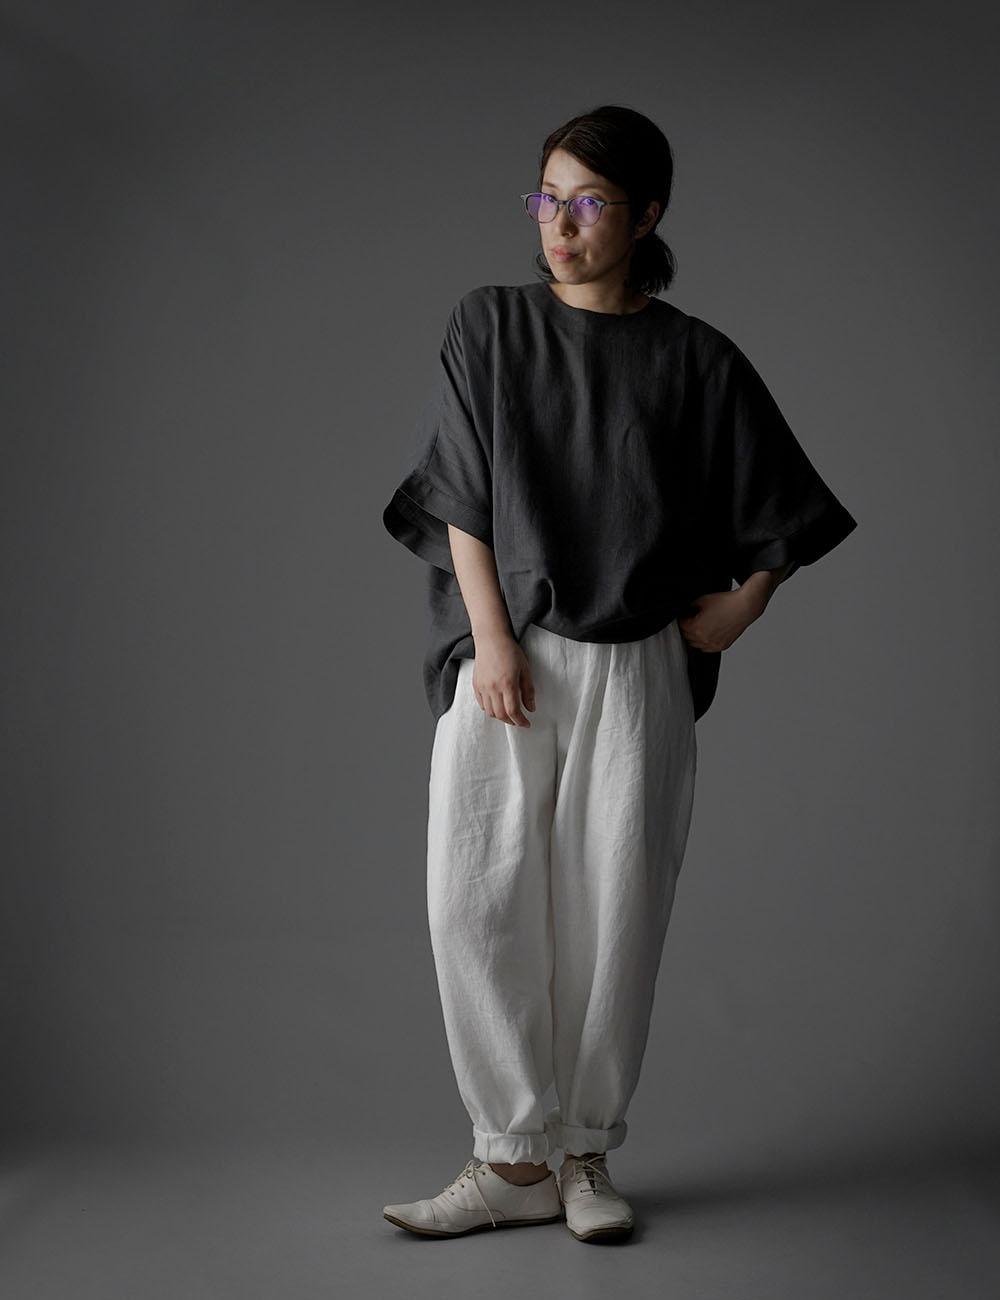 【wafu】薄地 リトアニアリネン ドロップショルダー リネンブラウス 襟ぐり小さめ ゆったり チュニック トップス Tシャツ / インクブラック t016g-ibk1